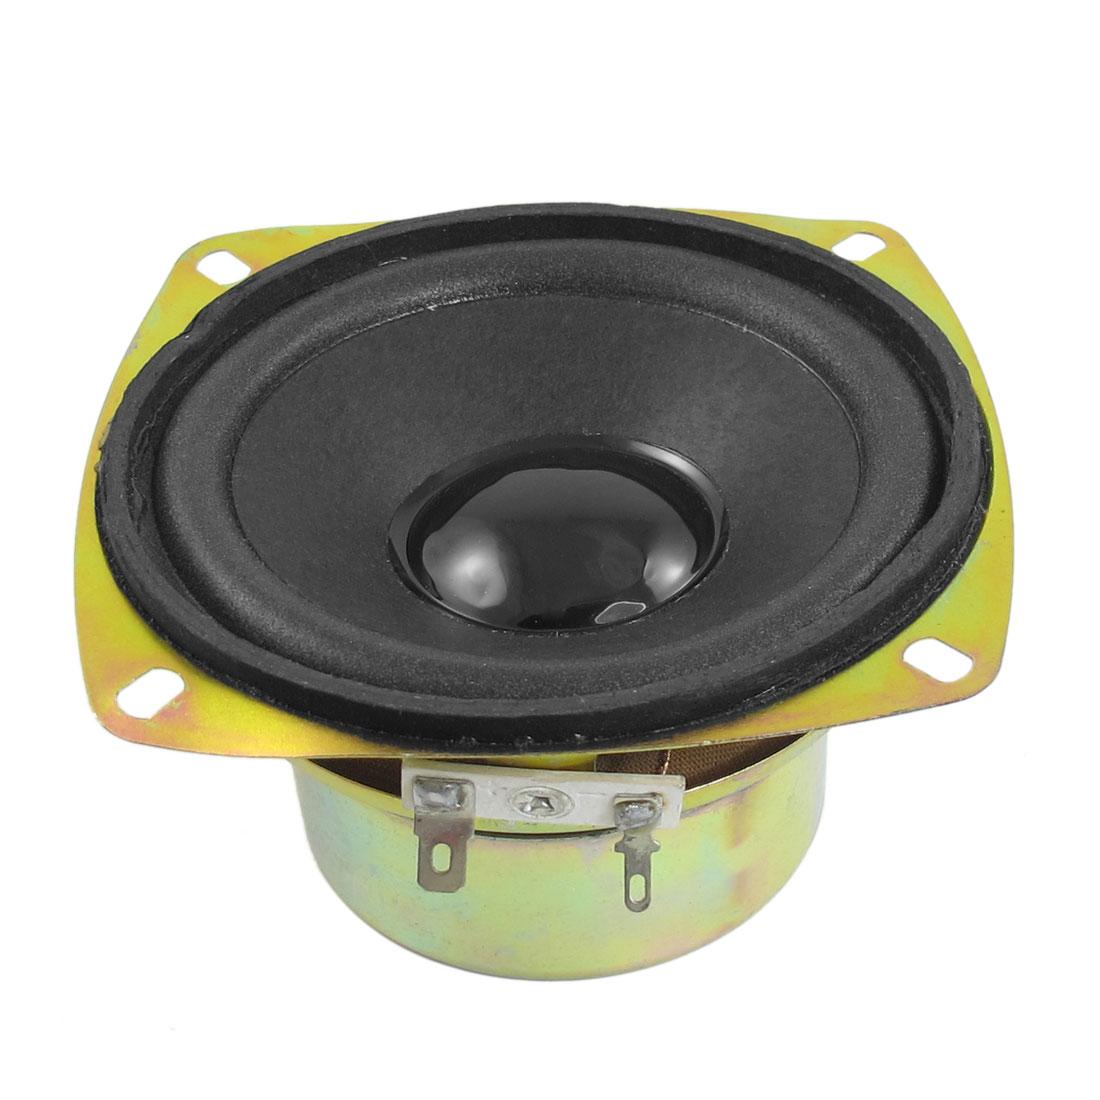 "15W 4 Ohm Aluminum Housing Round Internal Magnet Speaker 4"" Diameter"